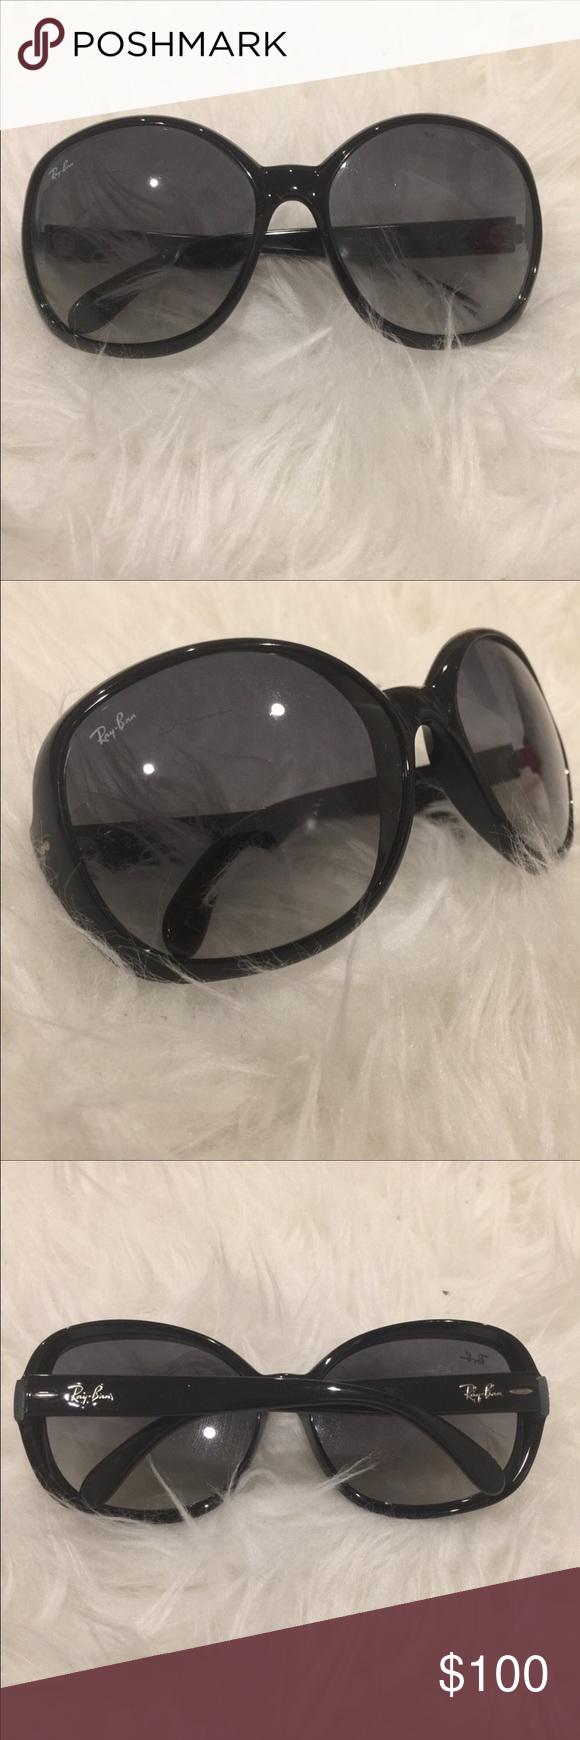 8d6468b7c84a Franco Sarto Wayfarer Sunglasses - Restaurant and Palinka Bar